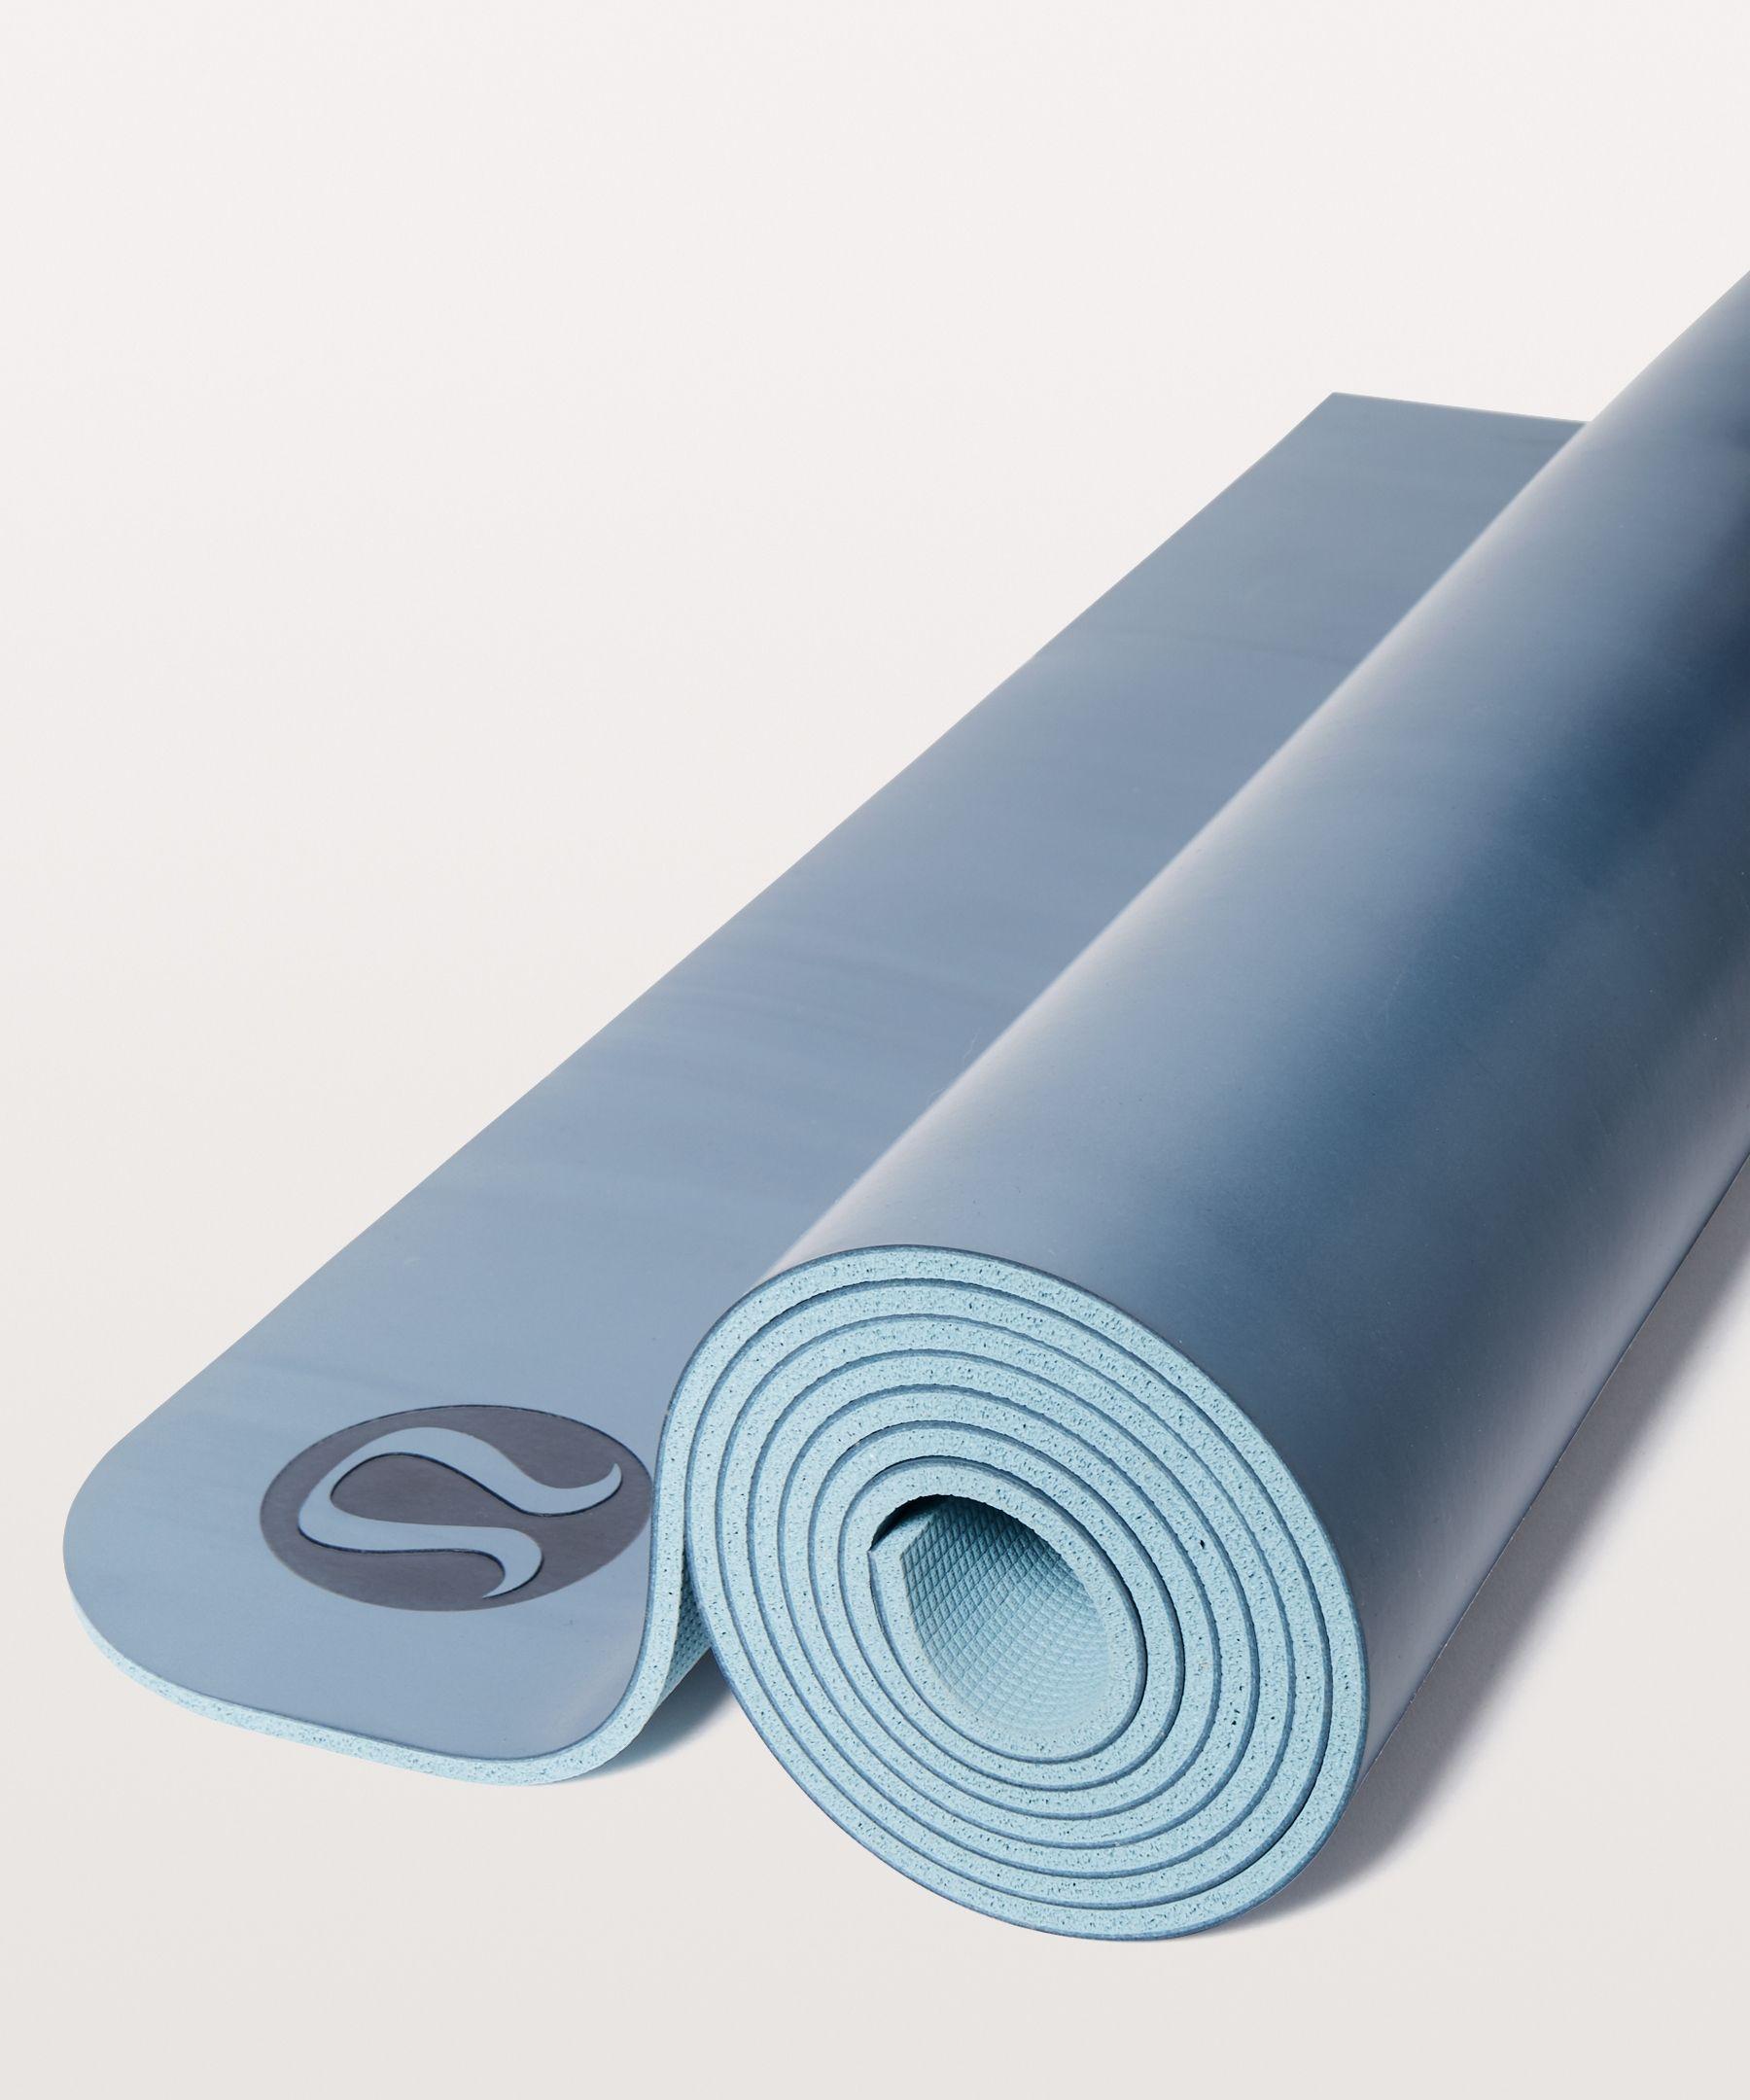 Lululemon The Reversible Mat 5mm Slate Blue White Cloud Blue Size One Size Lululemon Yoga Mat Yoga Women Yoga Mat